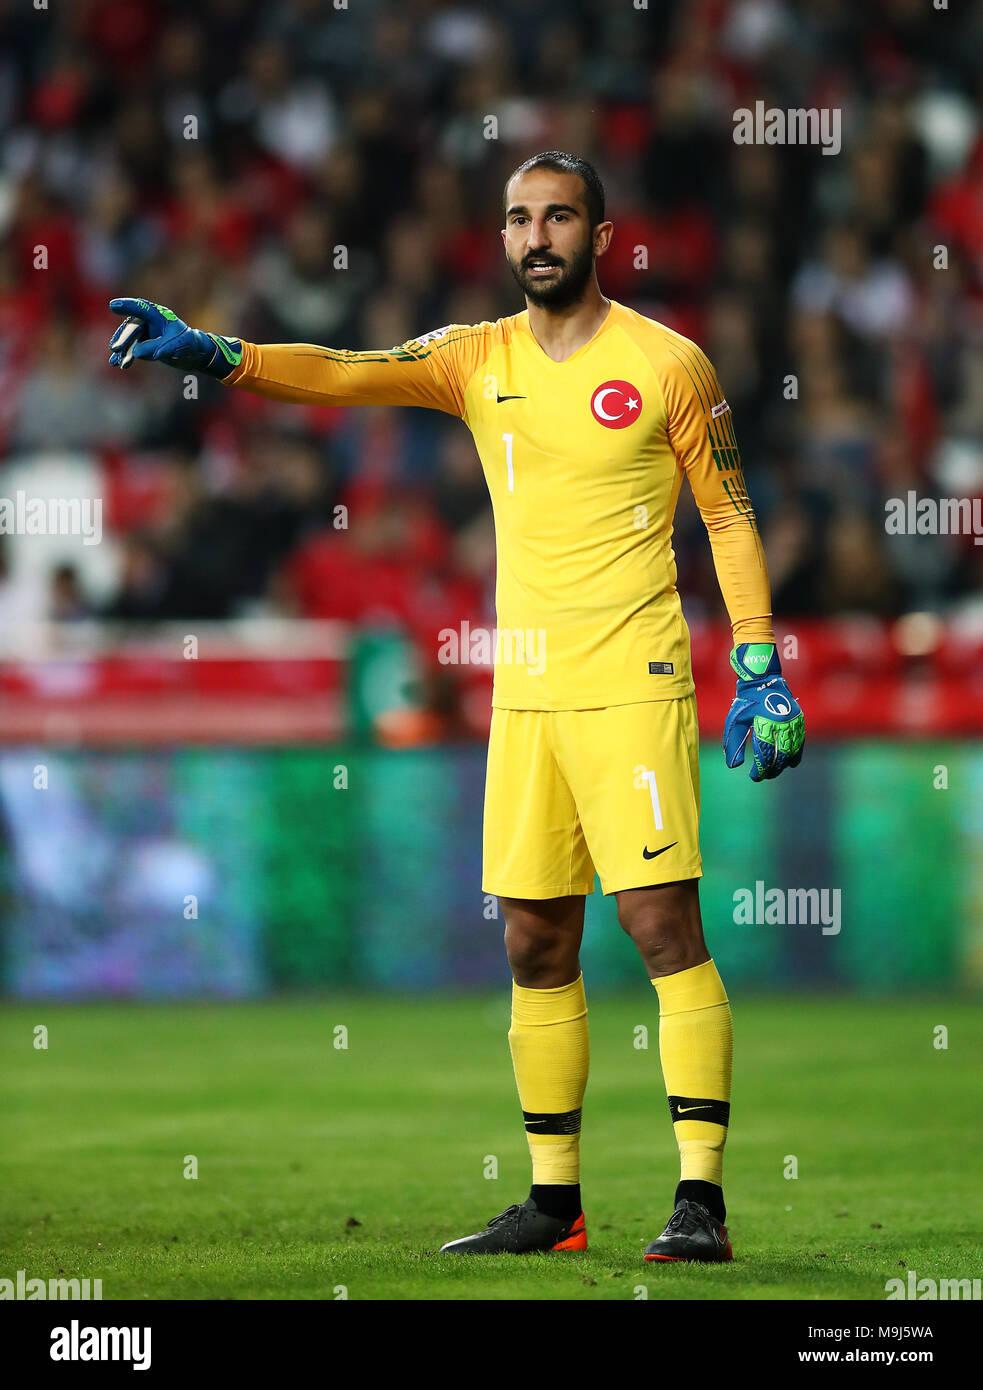 Turkey goalkeeper Volkan Babacan Stock Photo - Alamy